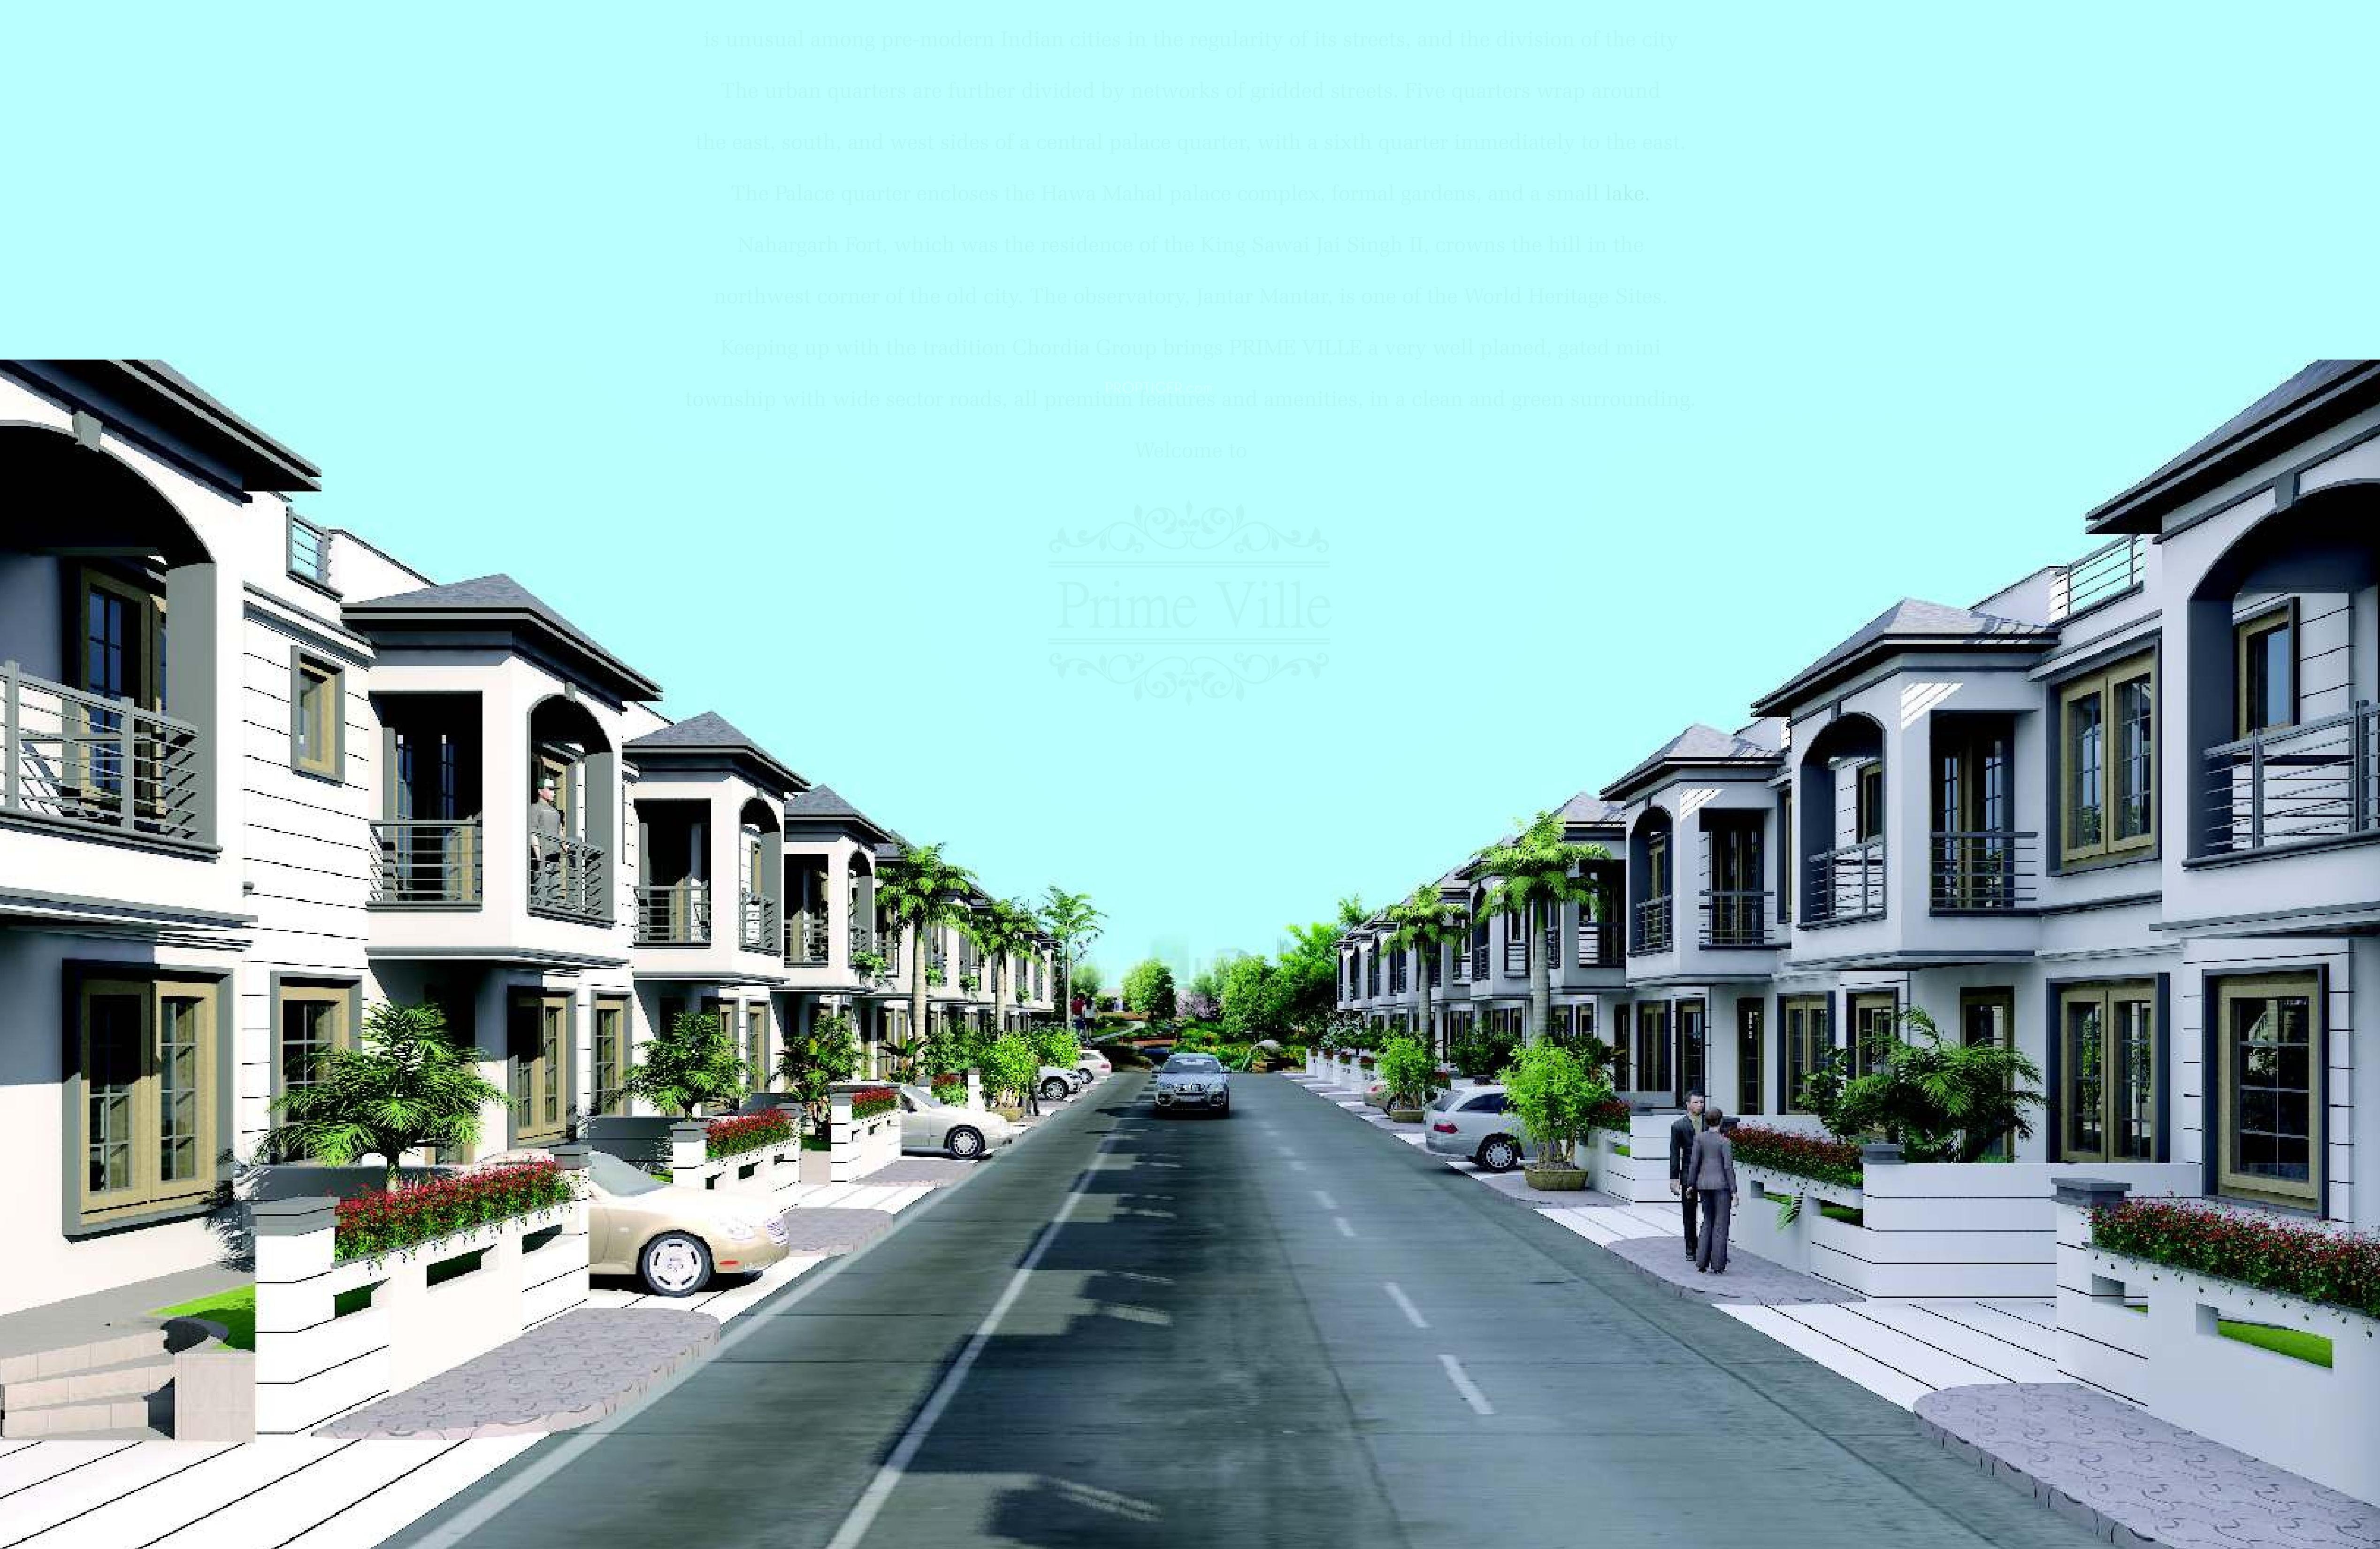 4 BHK Independent Houses in Jaipur - Buy 4 BHK Villas for Sale in Jaipur